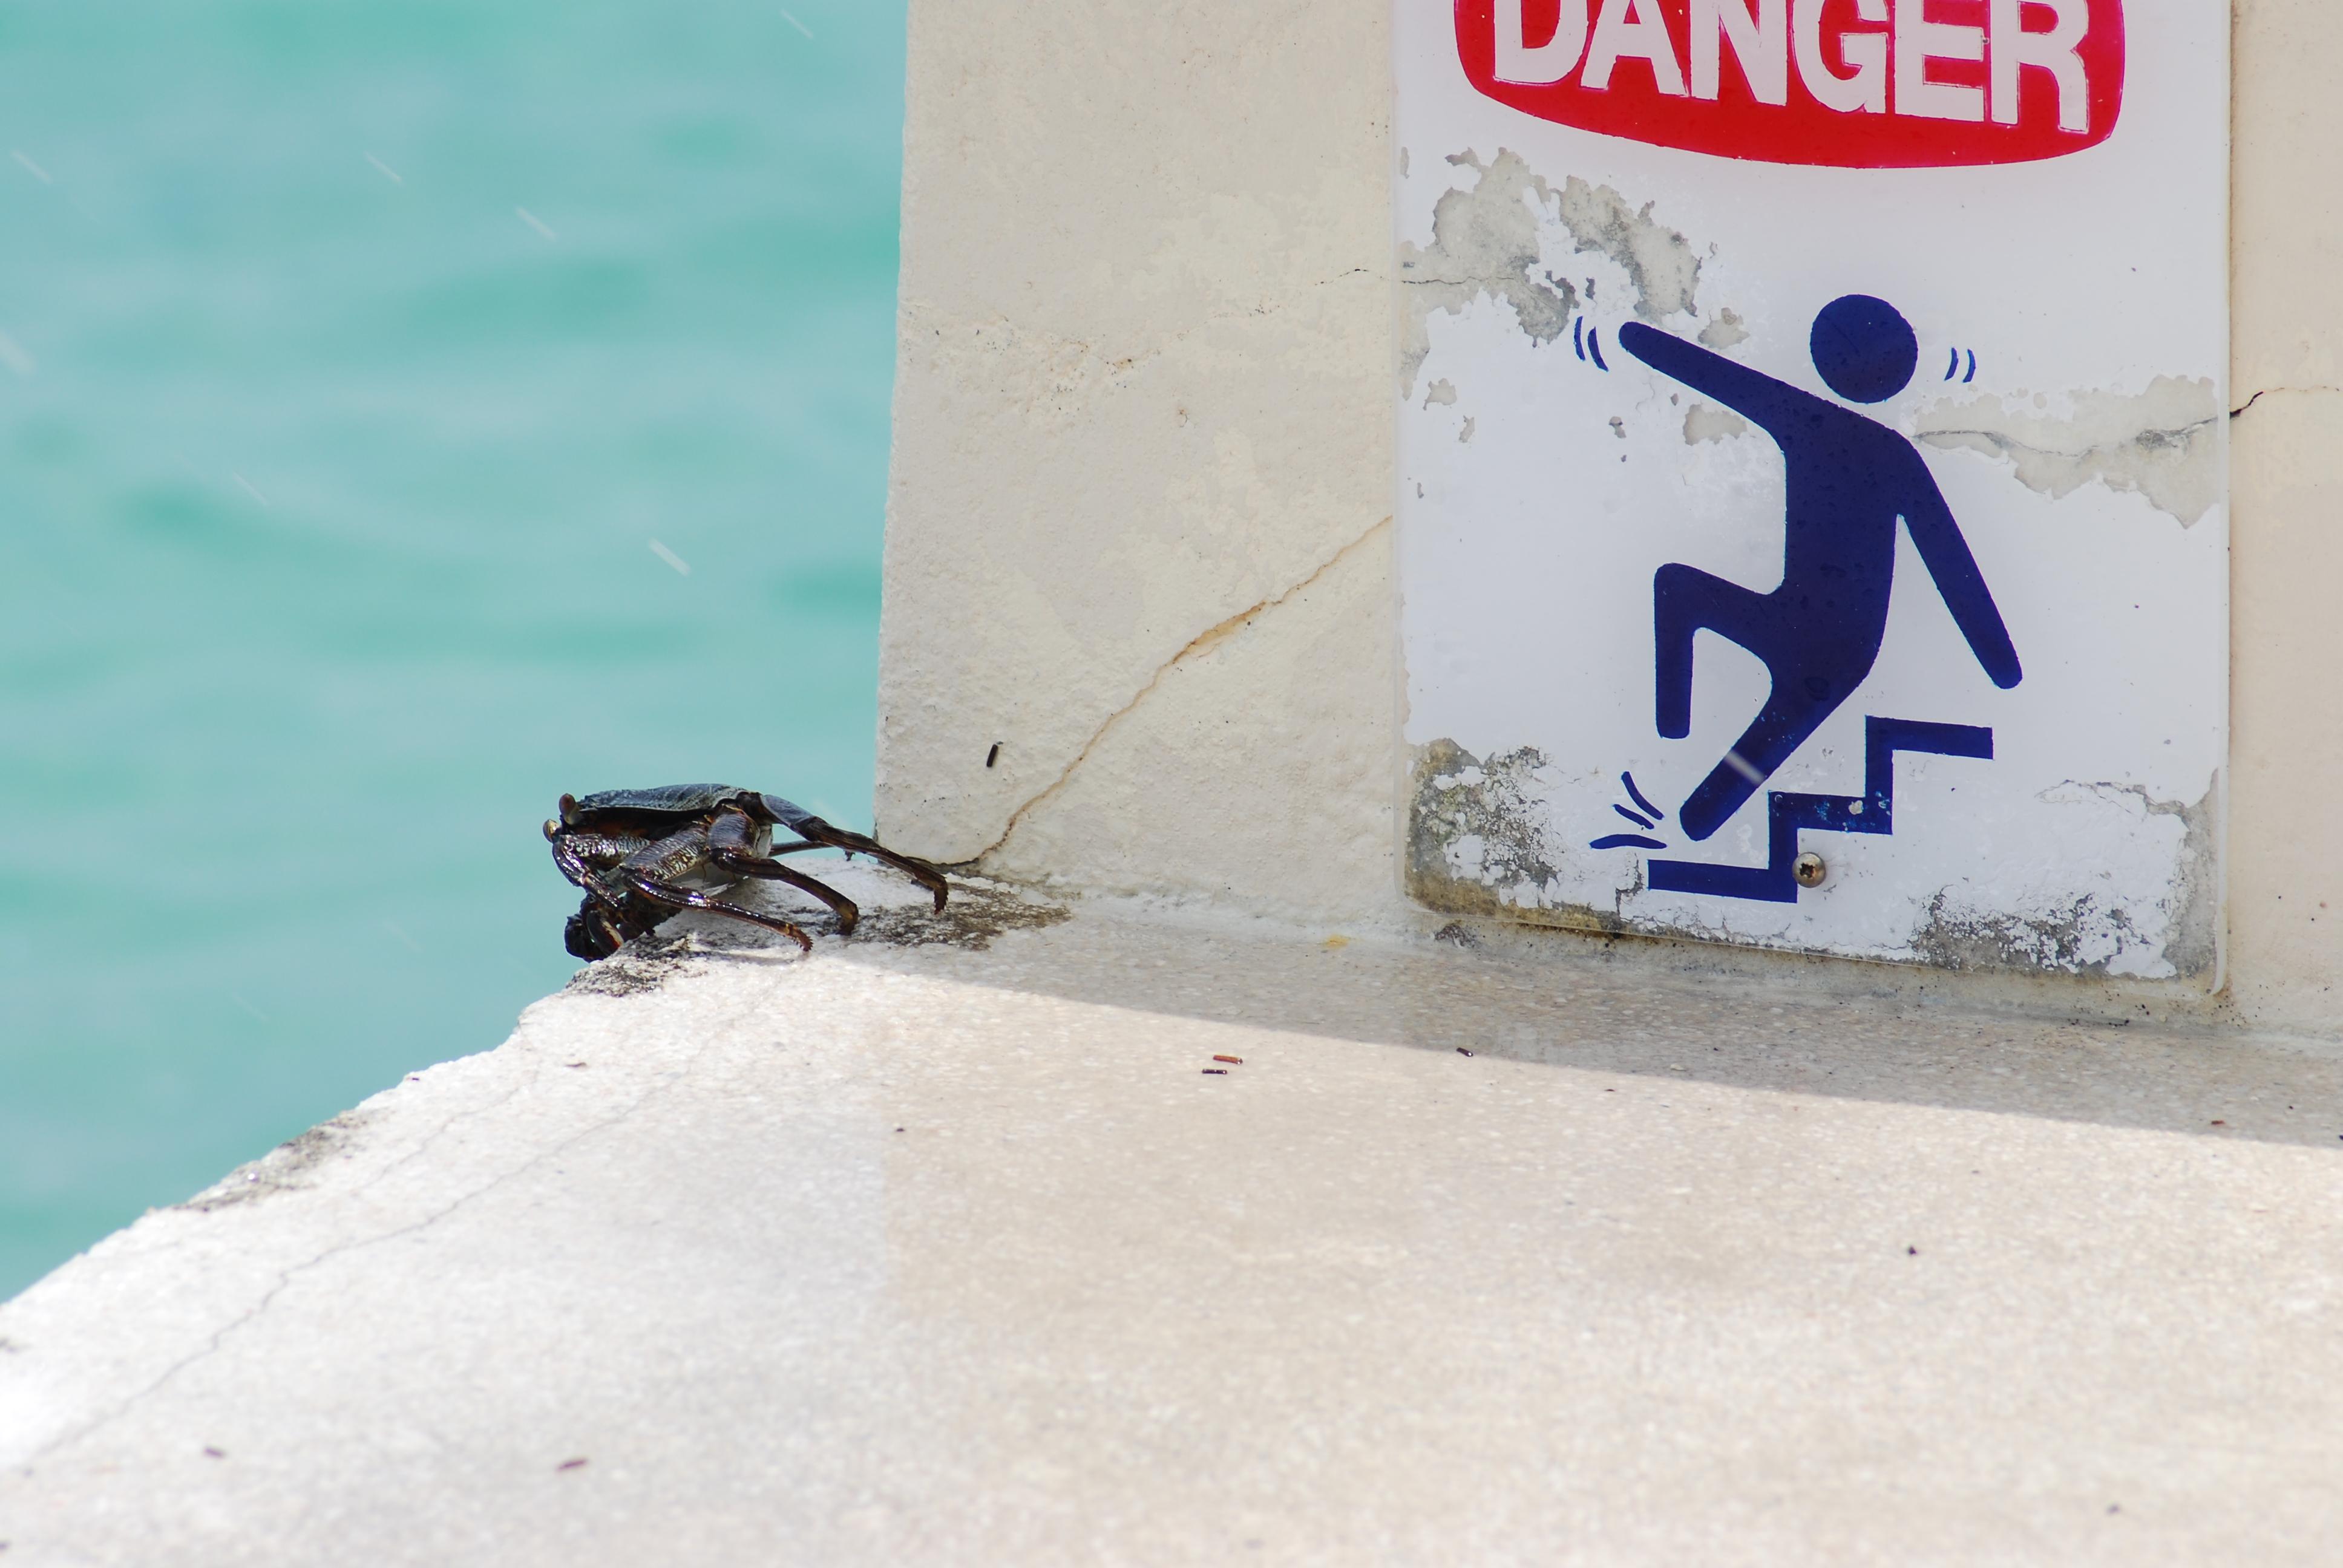 Krabbe in Gefahr